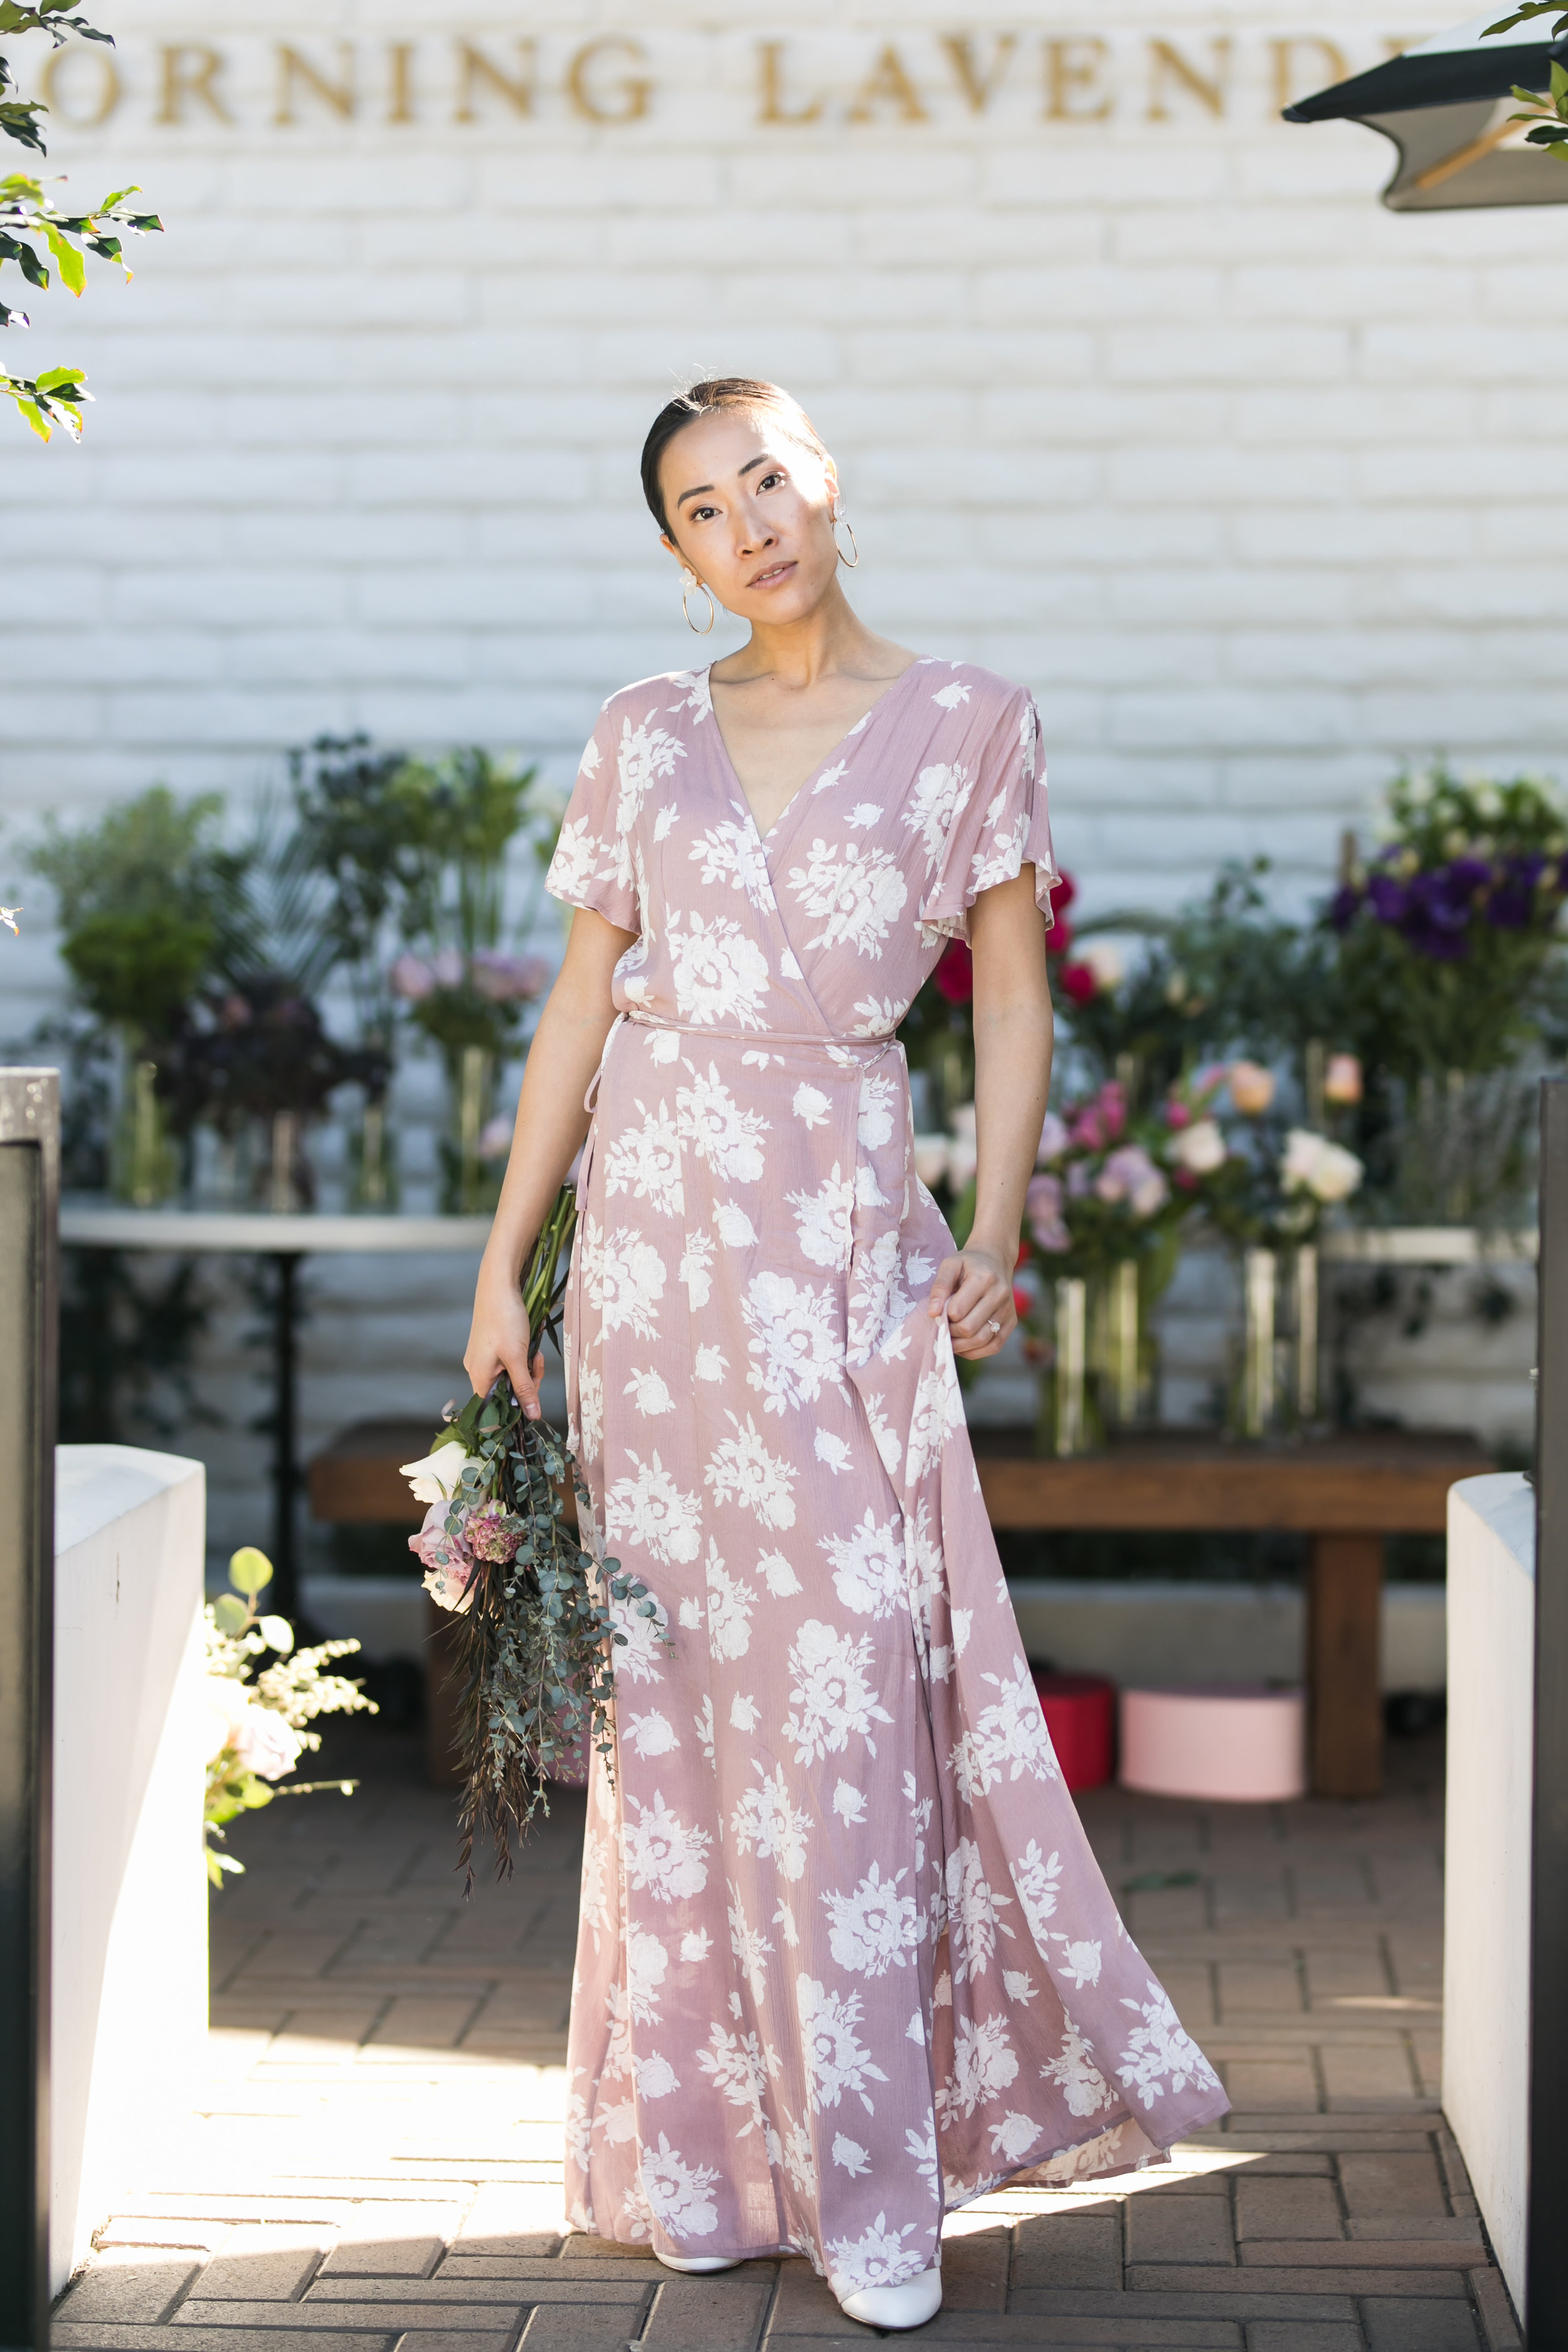 Morning Lavender Galentines 2019 - 065.jpg